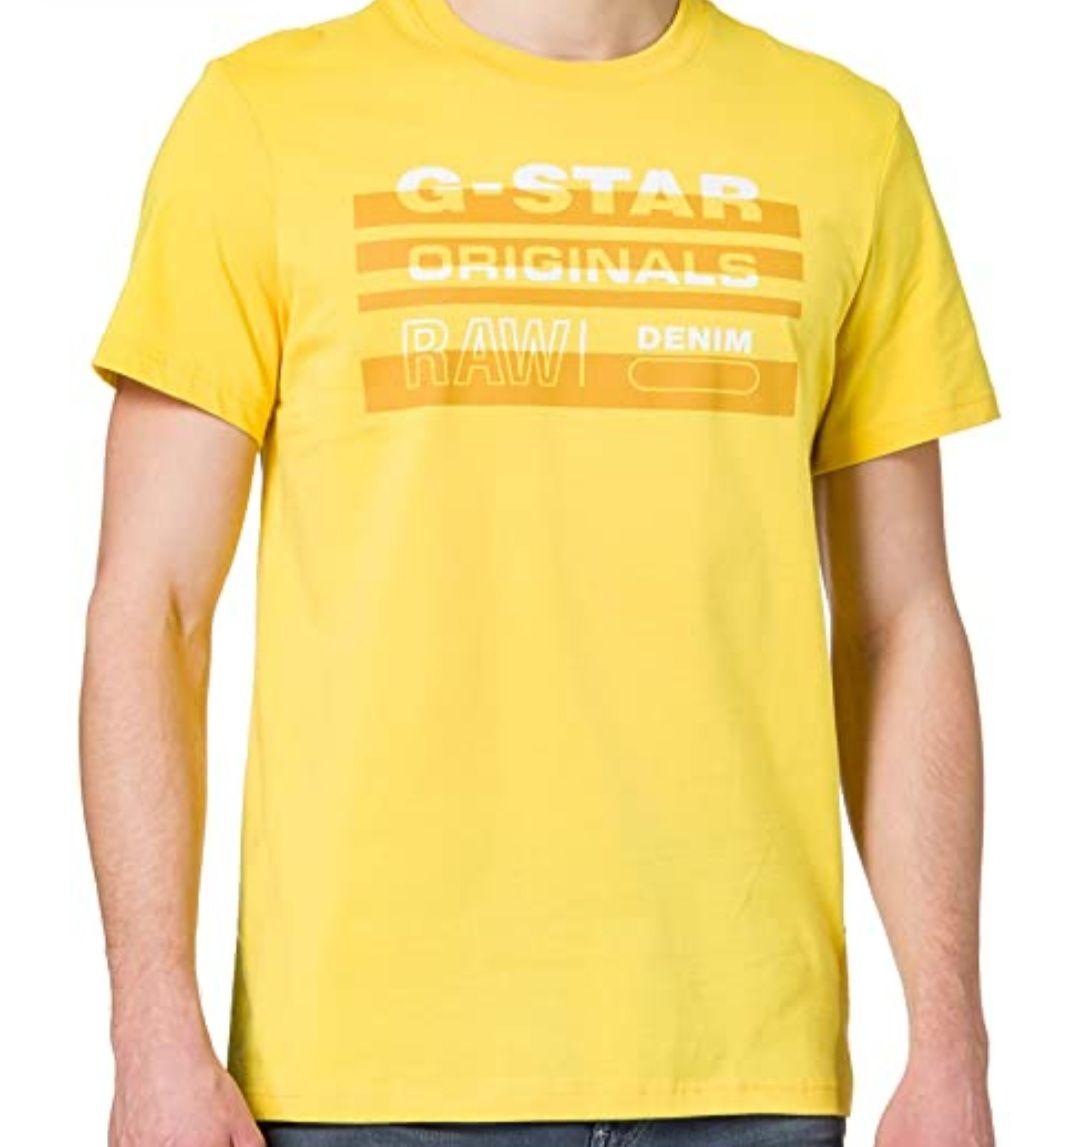 Camiseta g-star hombre